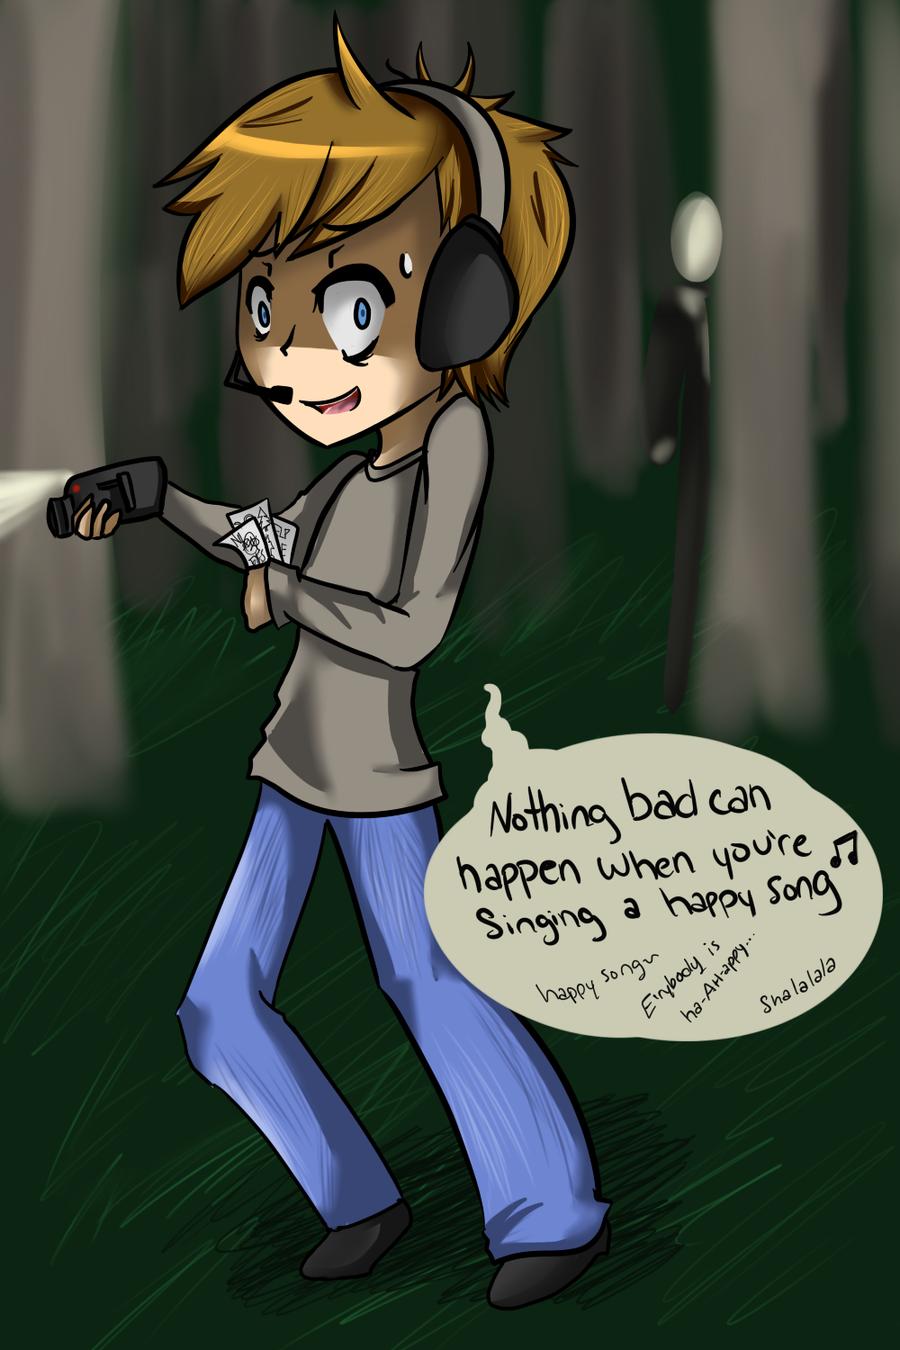 Slendy Happy Song by MischiefJoKeR